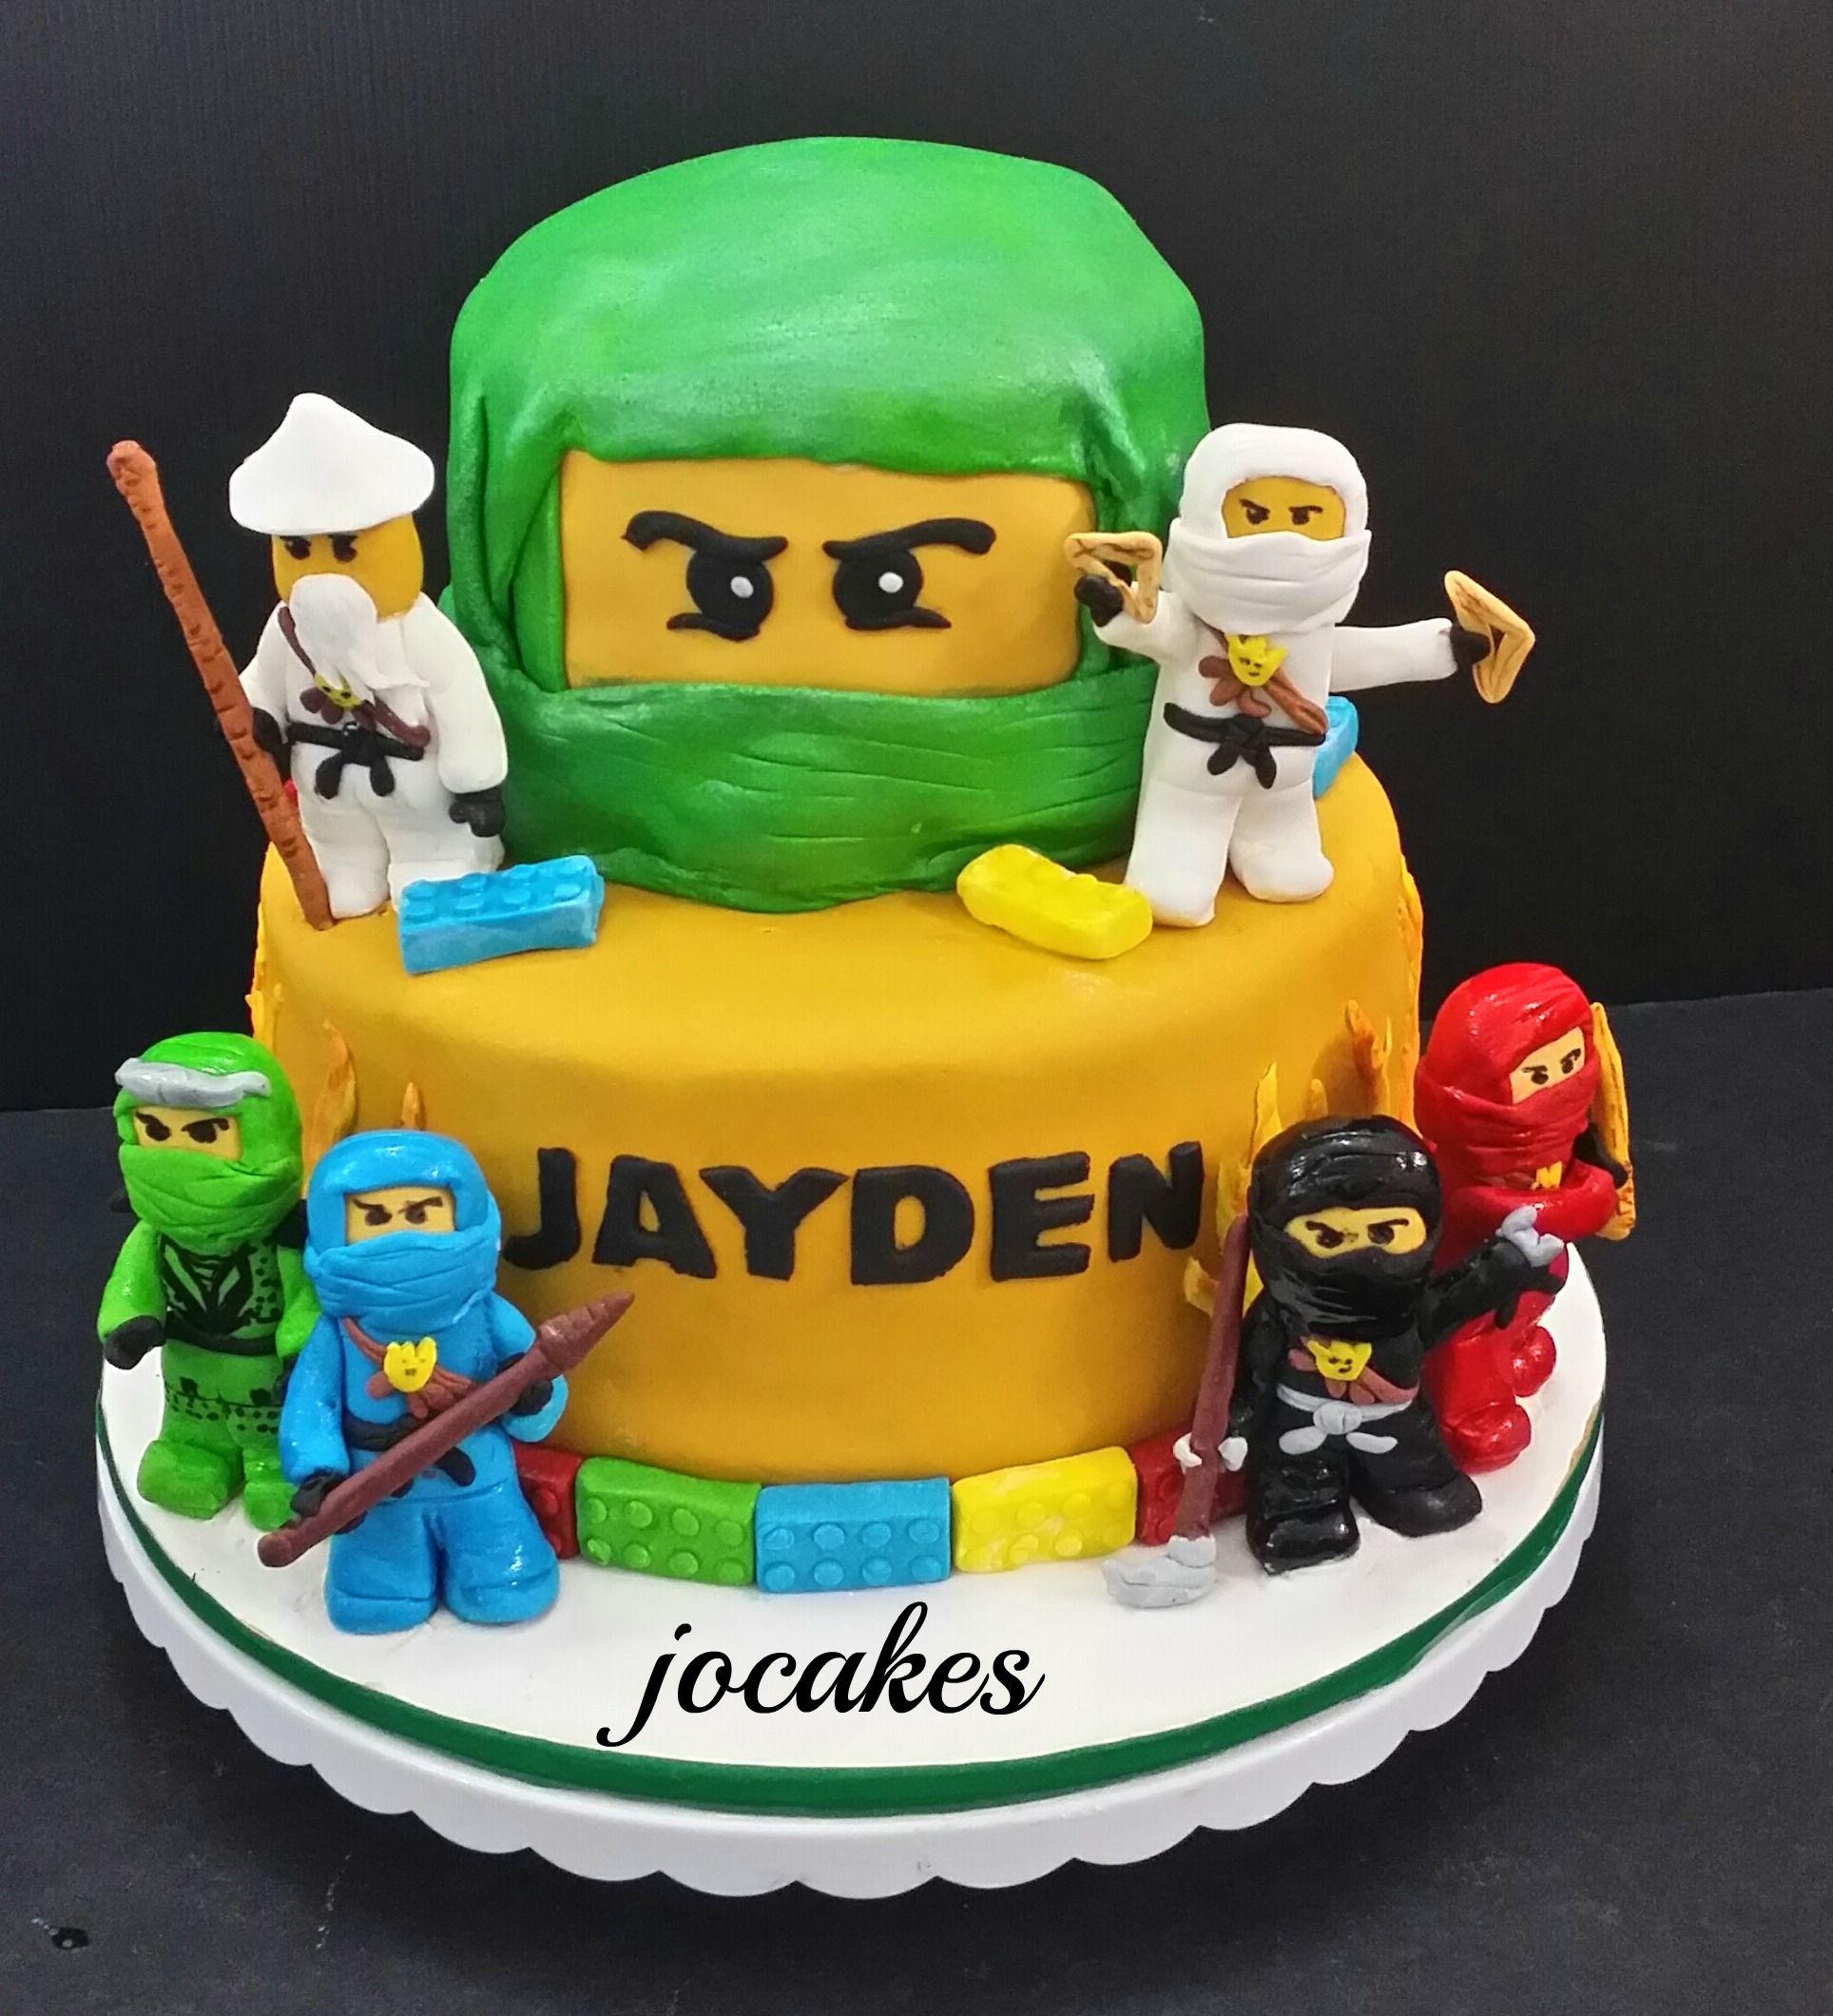 Lego Ninjago Birthday Party Google Search: Lego Ninjago Cake - Google Search